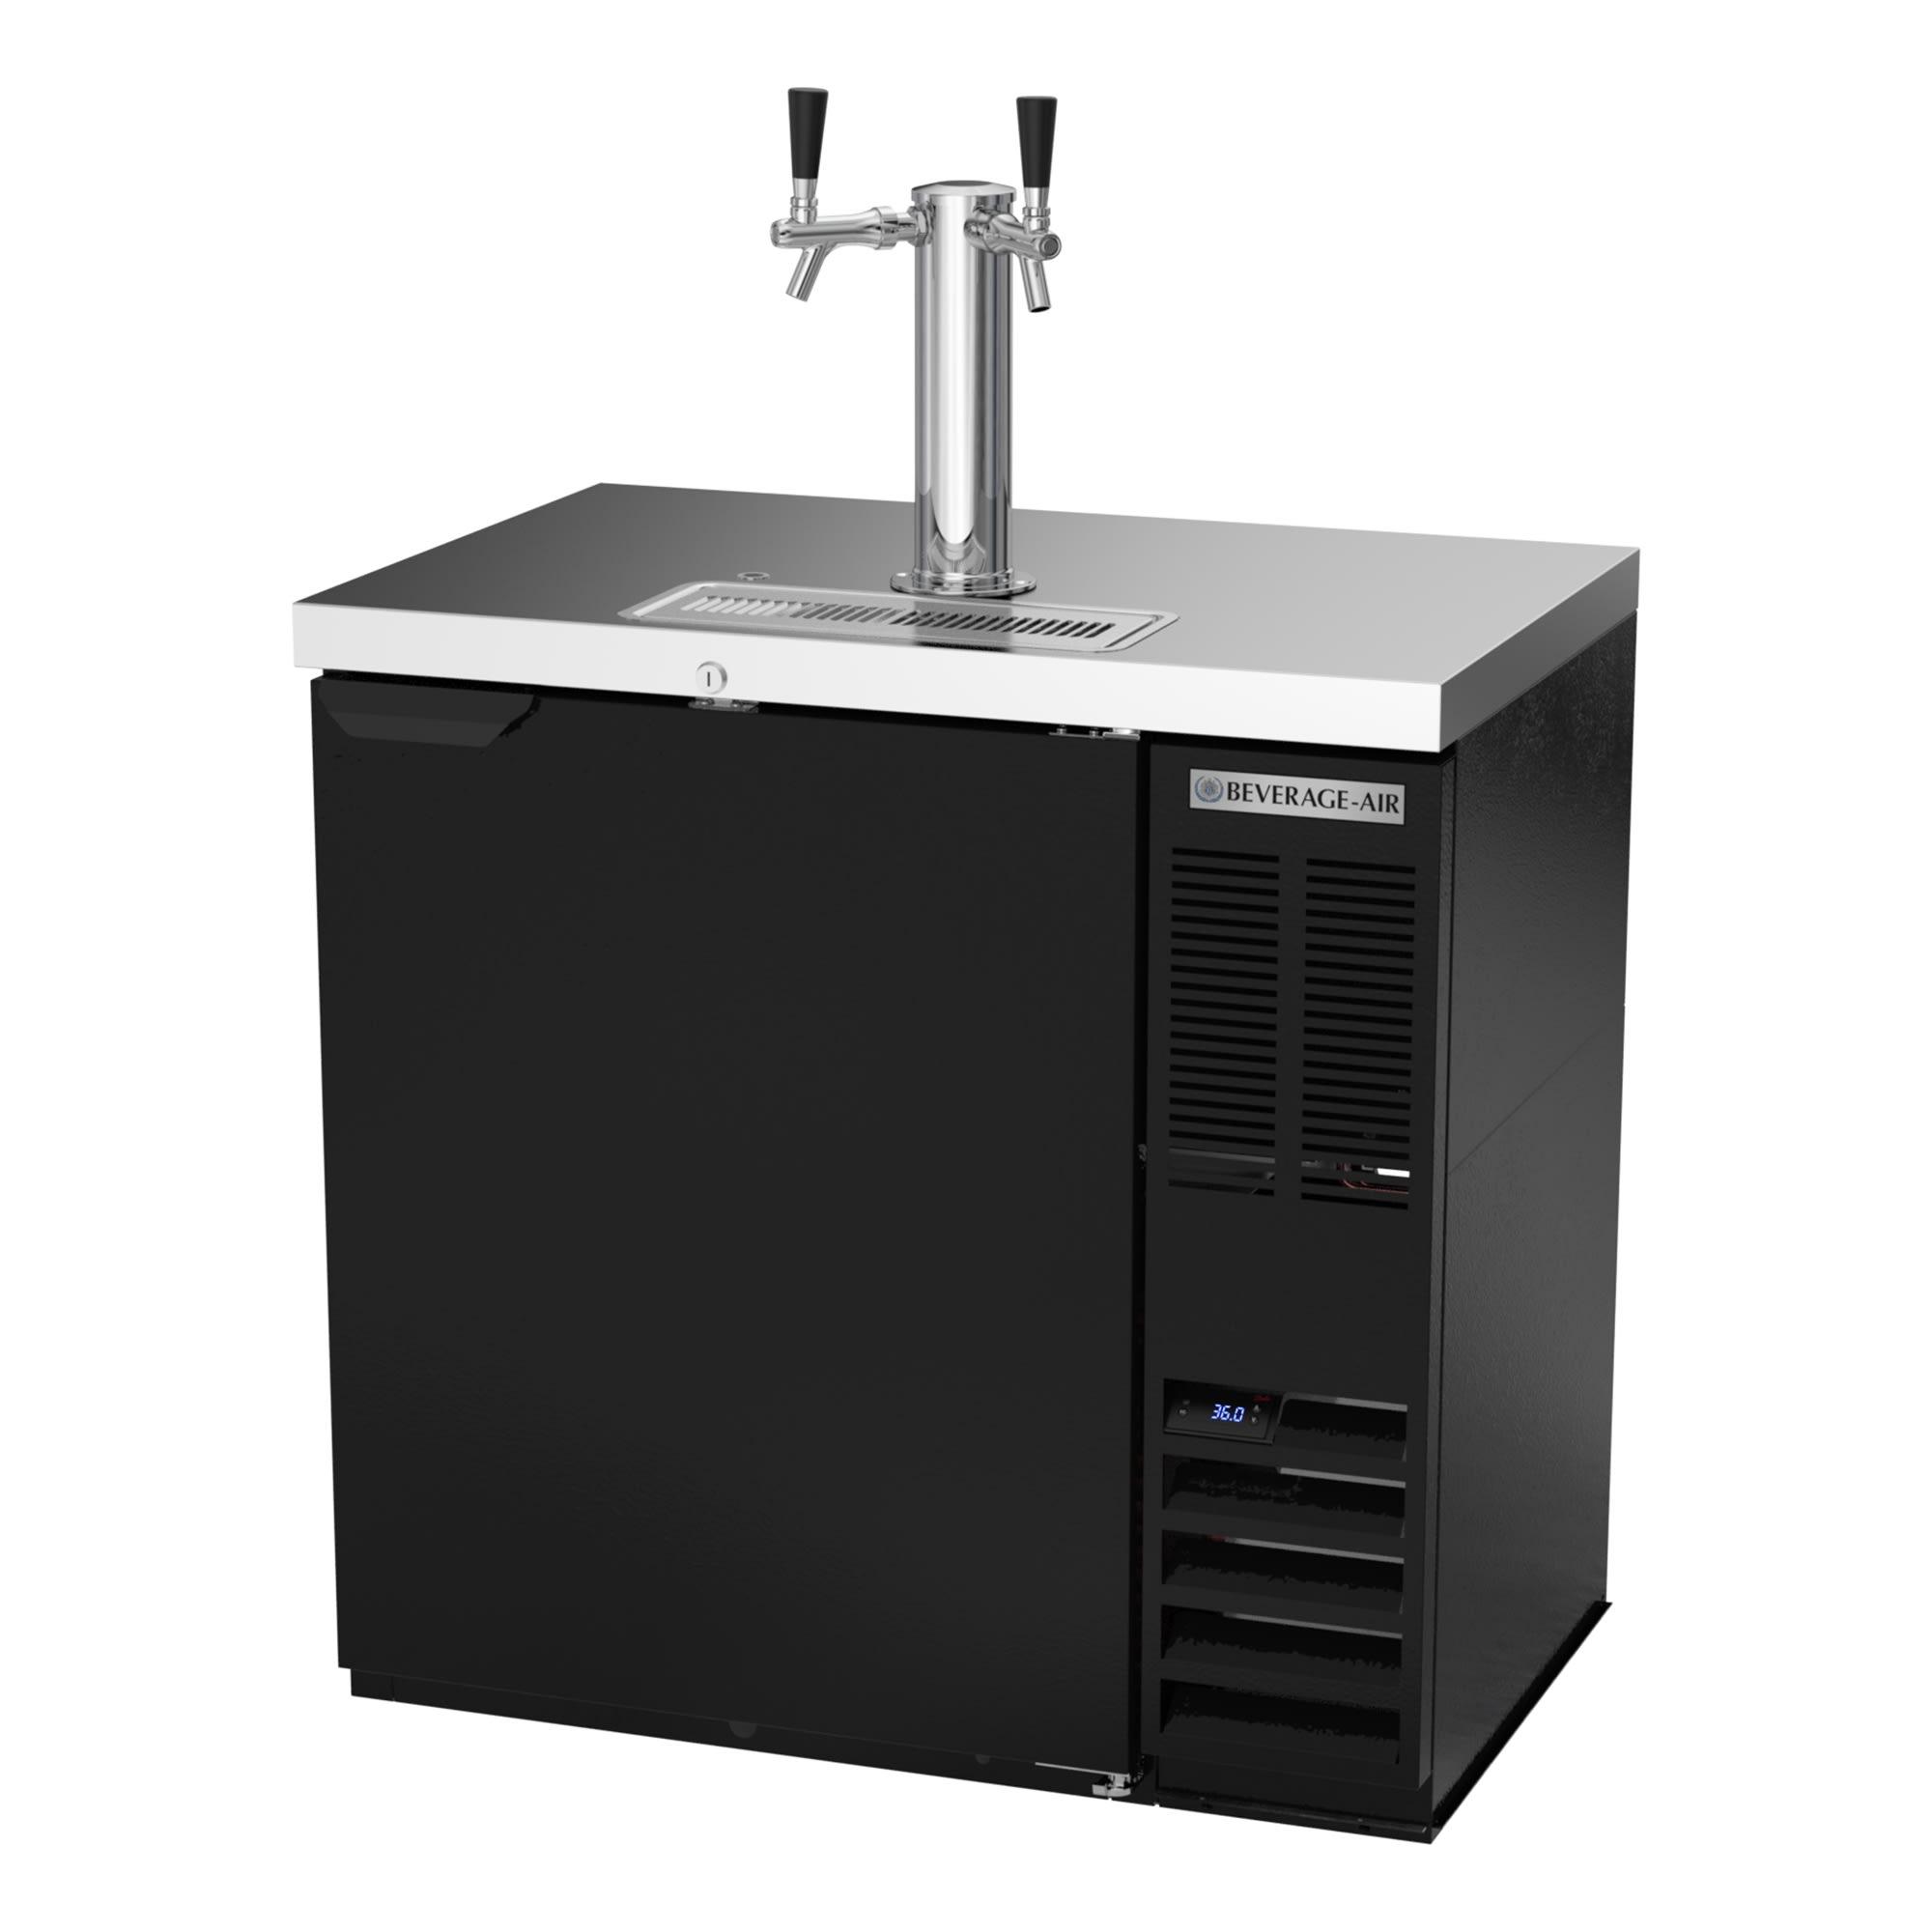 "Beverage Air DD36HC-1-B 36"" Draft Beer System w/ (1) 1/2 Keg Capacity - (1) Column, Black, 115v"